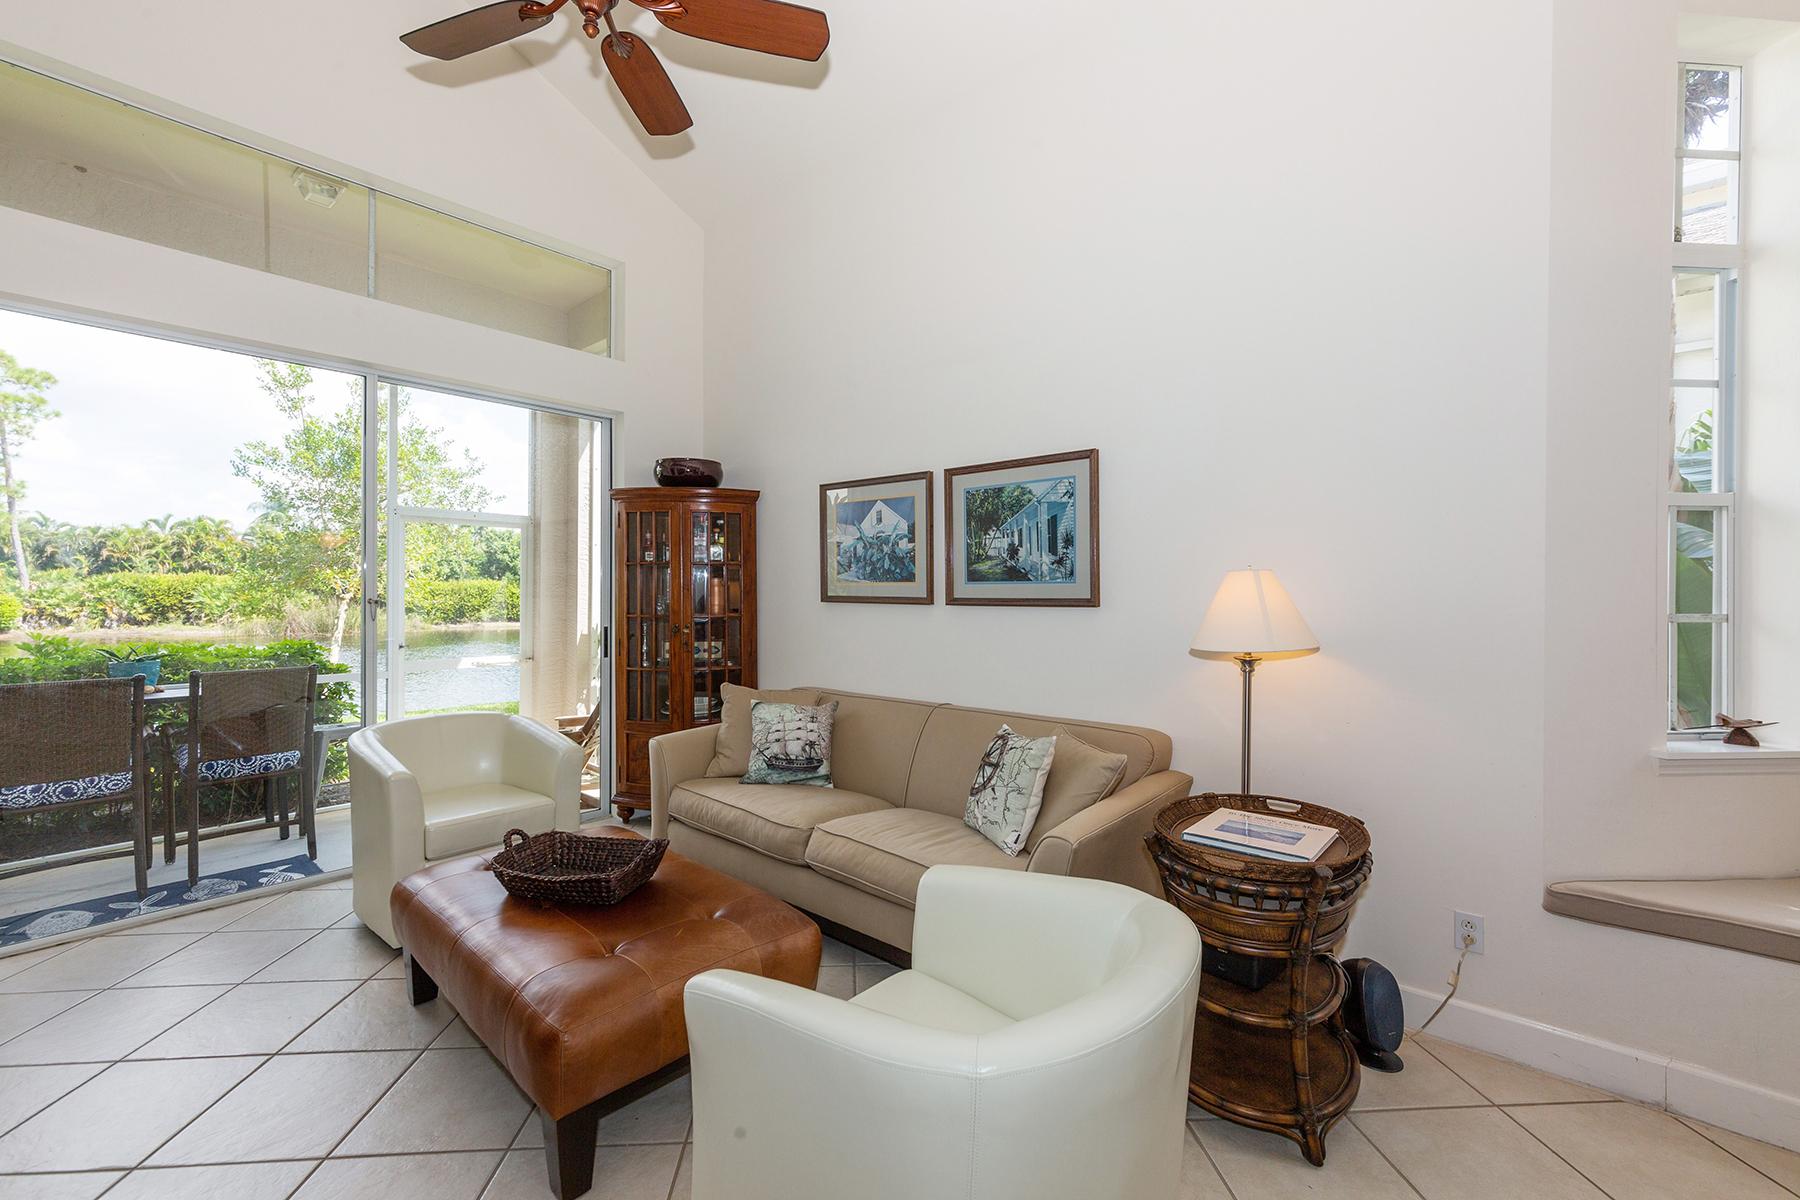 Other Residential Homes 용 임대 에 14819 Sterling Oaks Dr, 나폴리, 플로리다 34110 미국